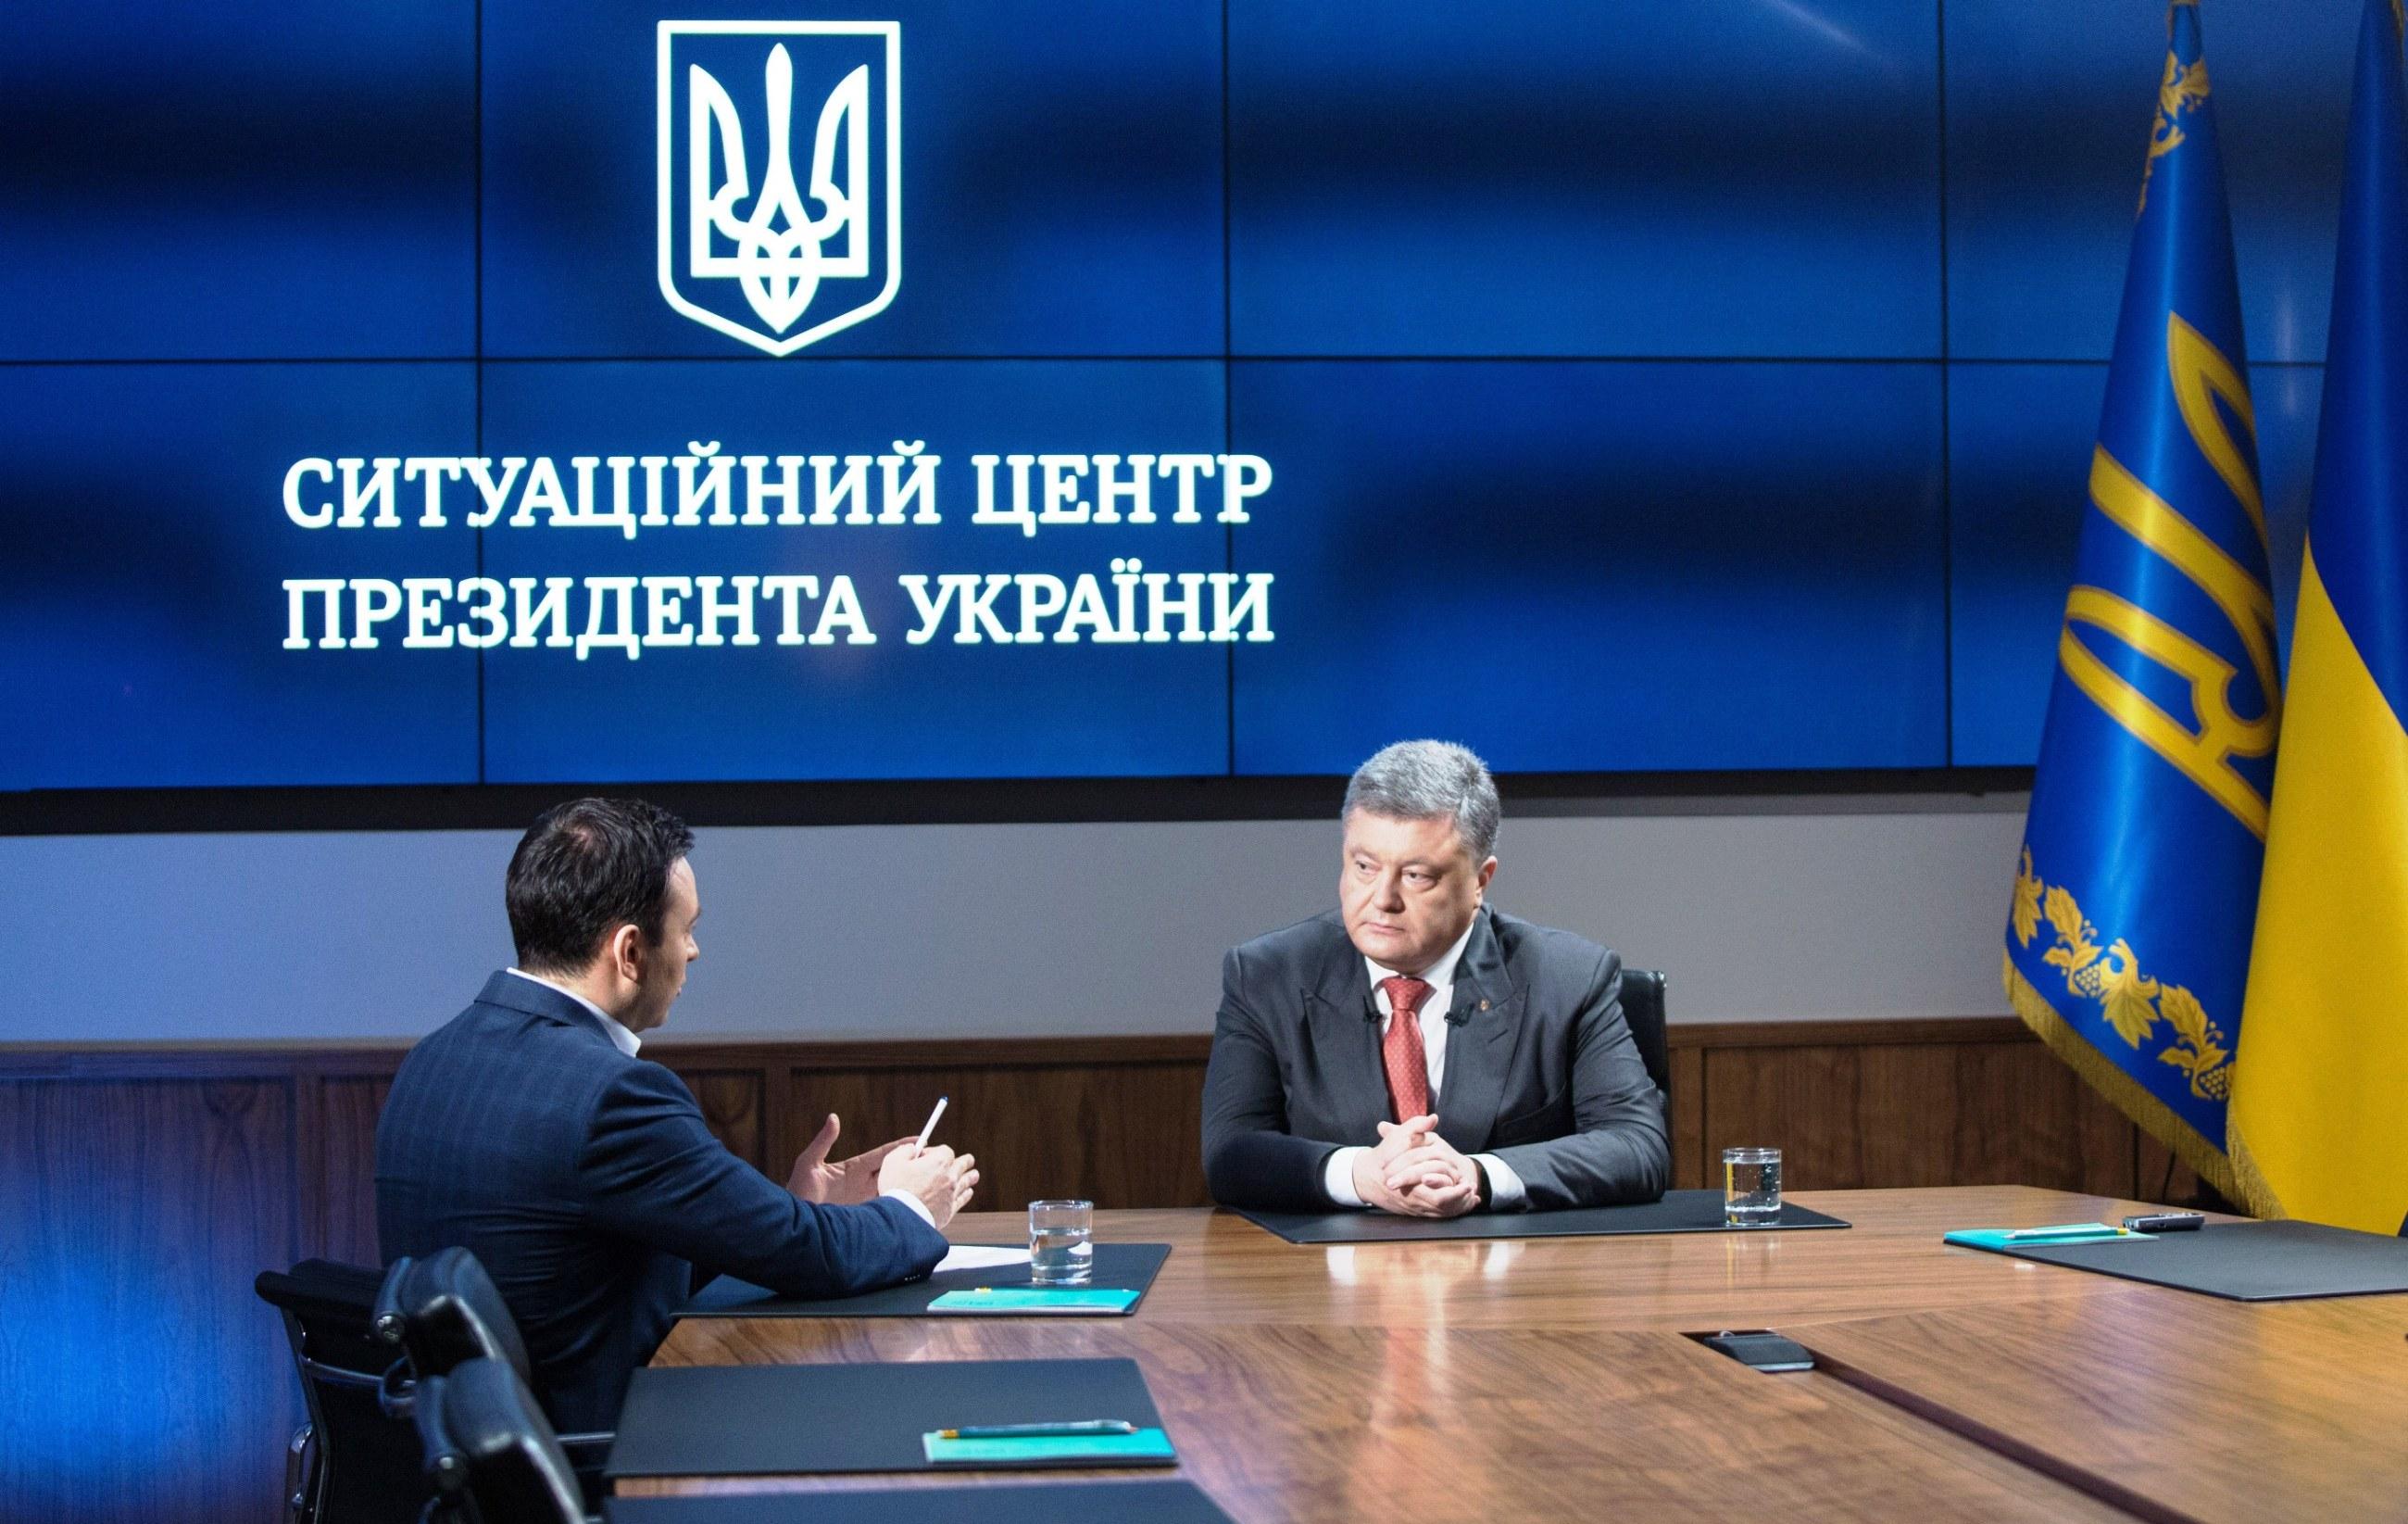 President on liberation of Savchenko: I was not going to trade either Nadiya, or Ukraine